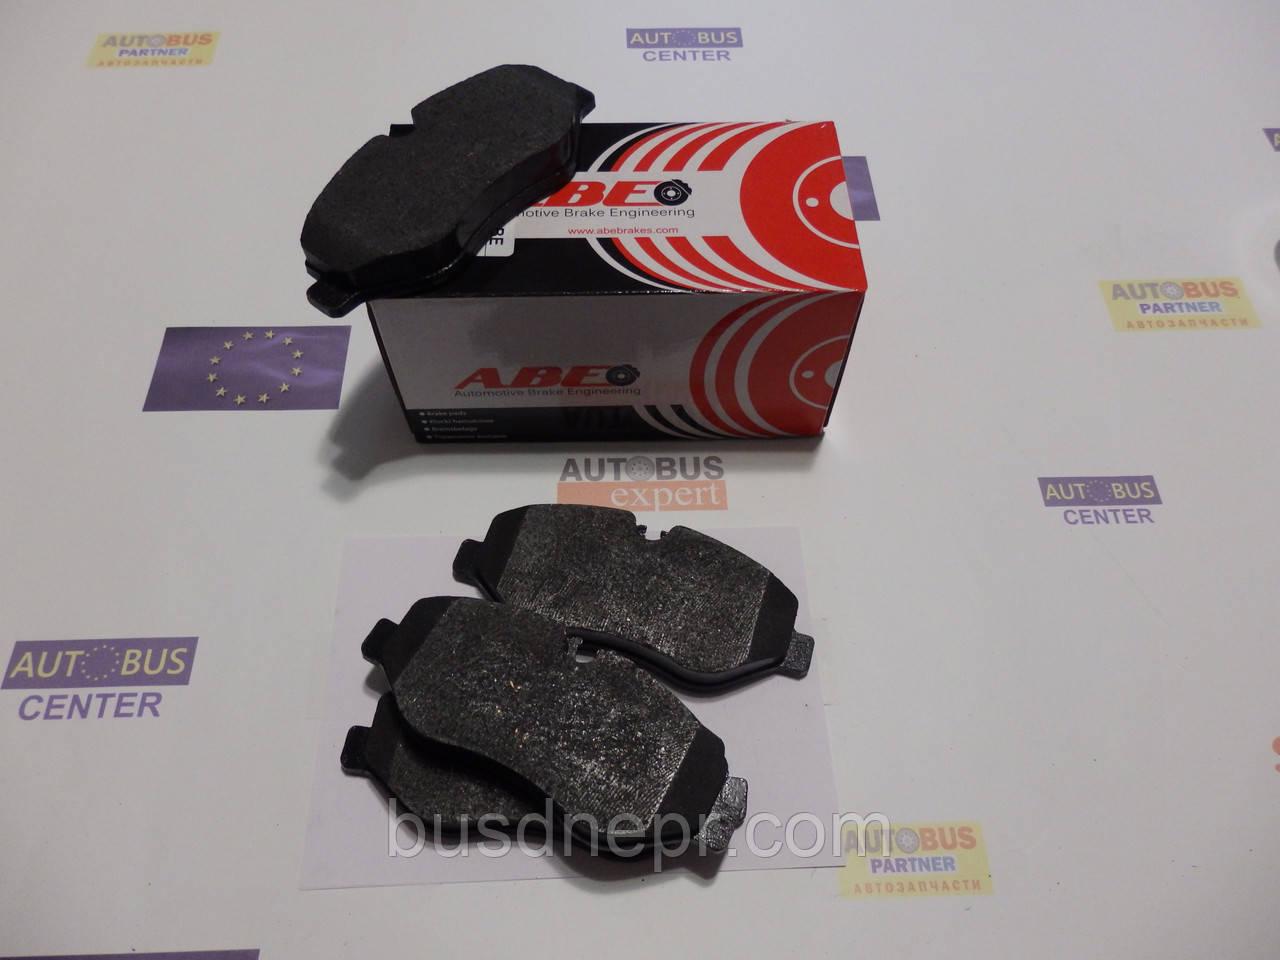 Тормозные колодки, передние (не спарка) MB Sprinter, VW Crafter 06- ABE C1M045ABE